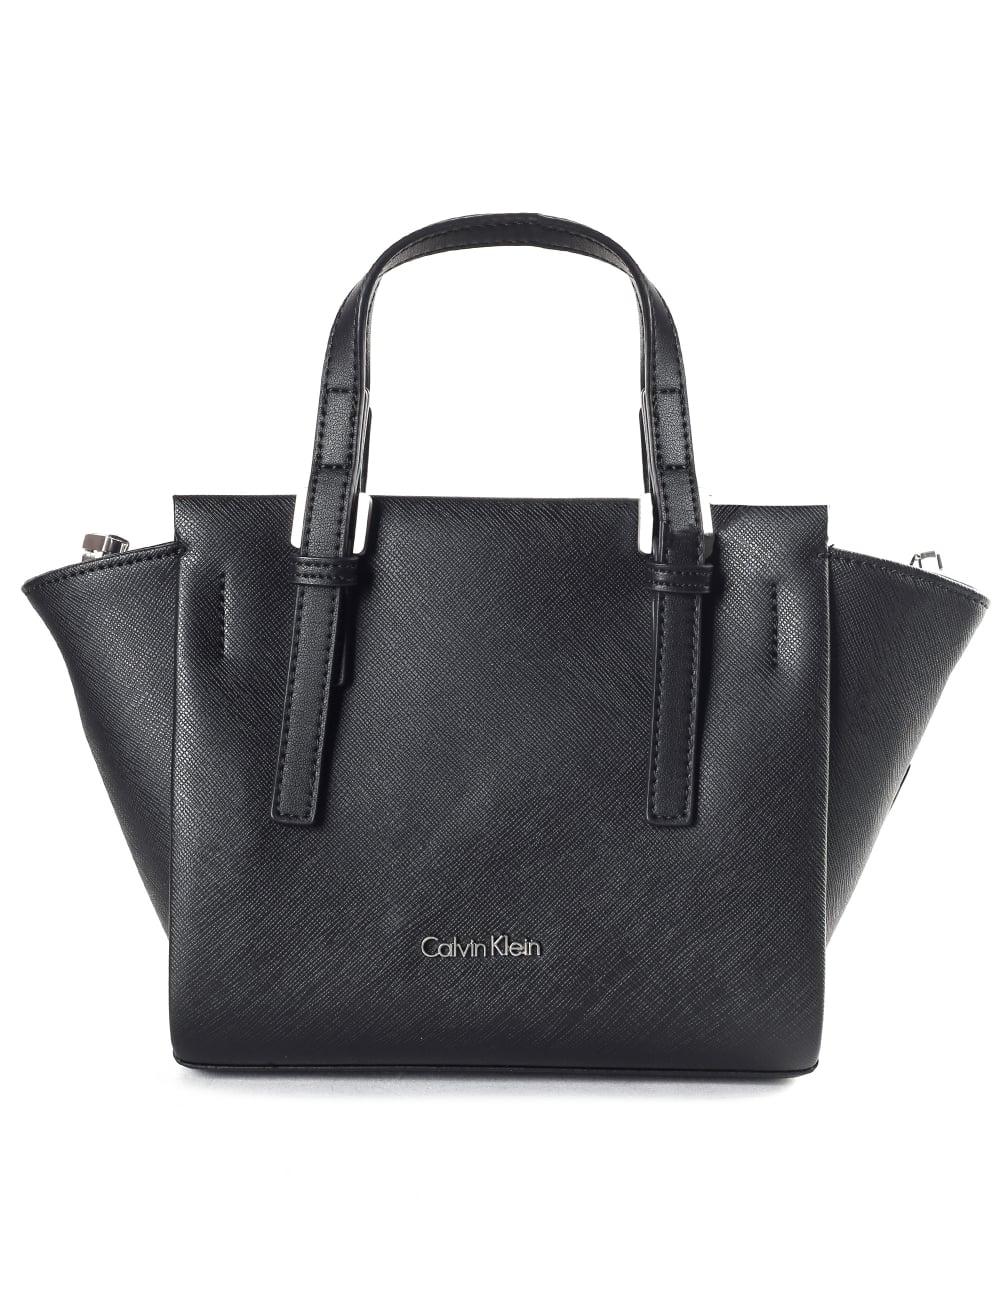 Calvin Klein Women s Marissa Mini Tote Bag Black e0ea422024